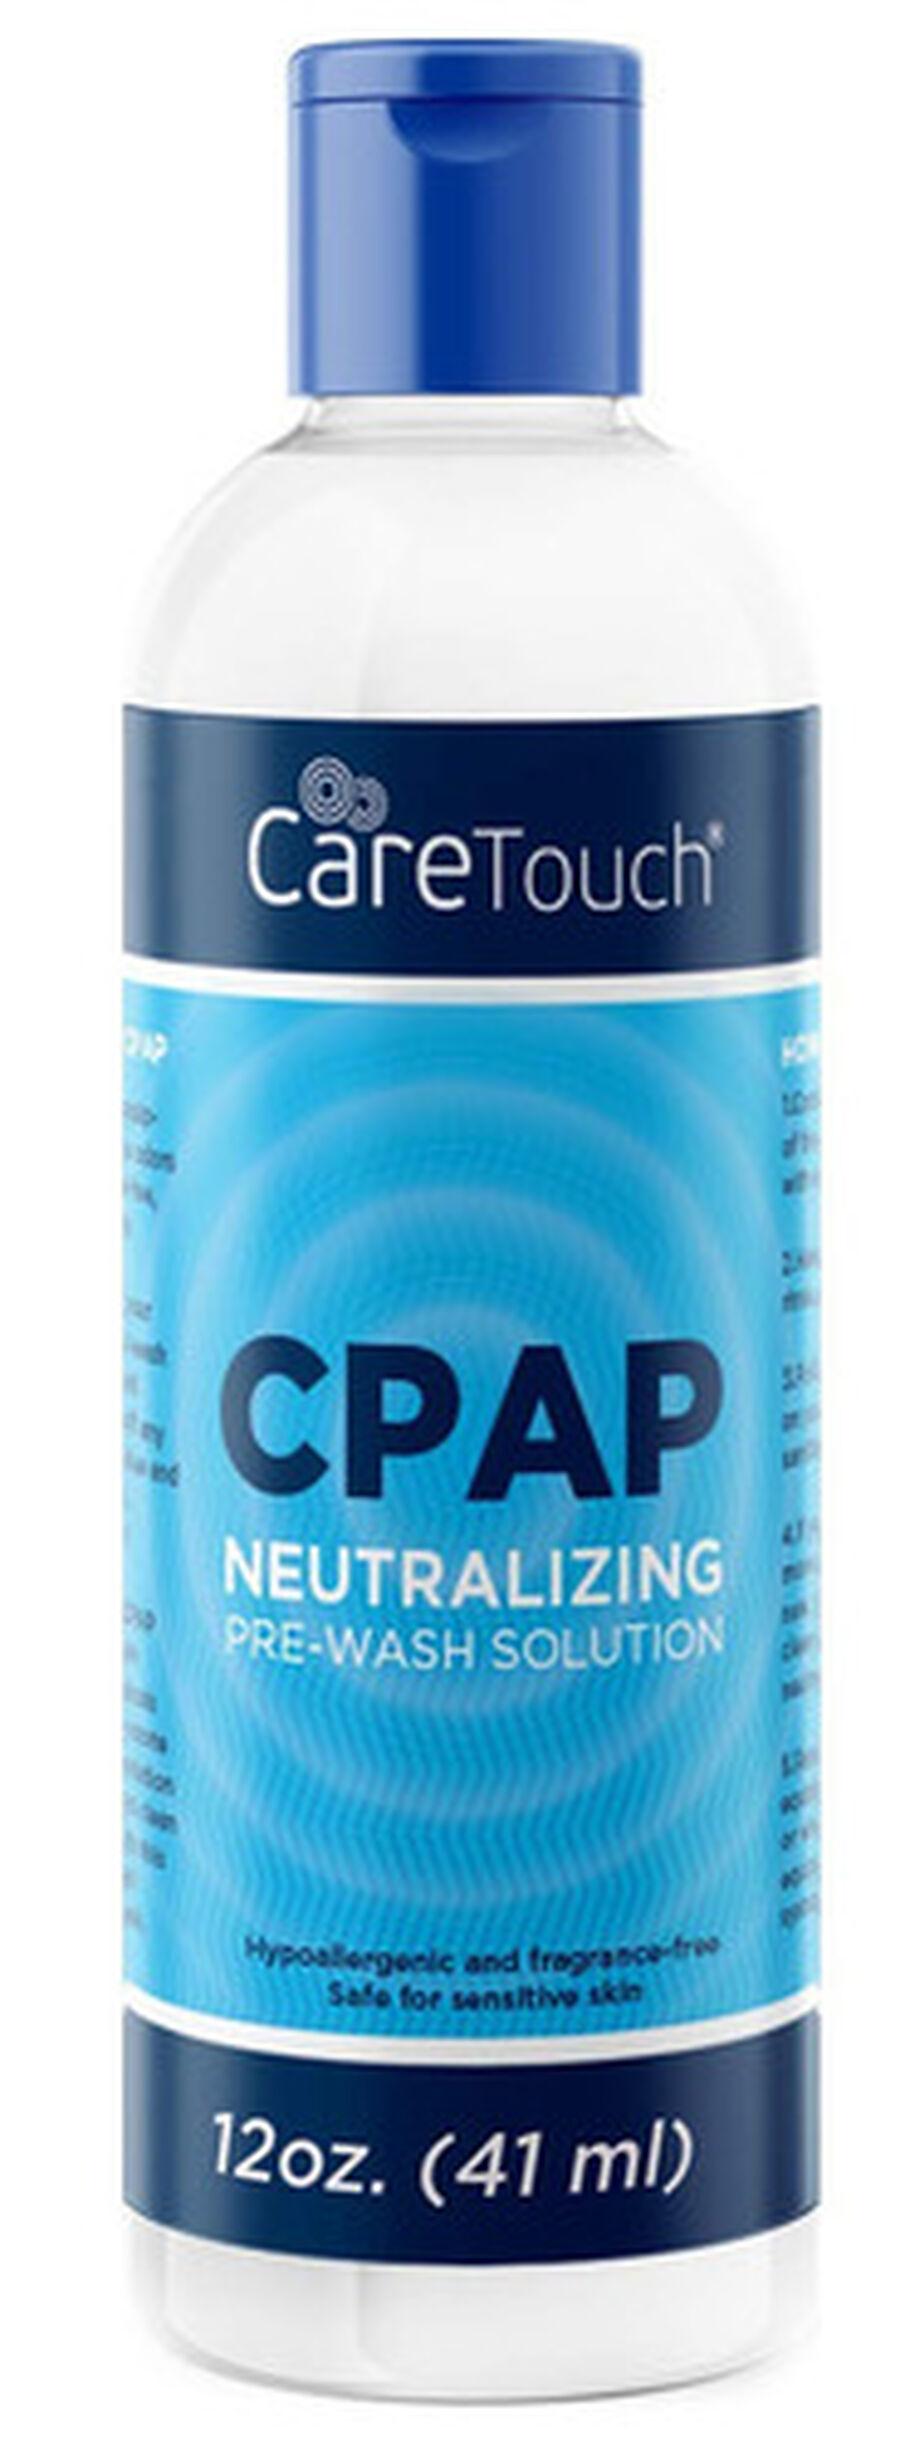 CareTouch CPAP Neutralizing Pre-Wash Solution, 12 fl oz, , large image number 0